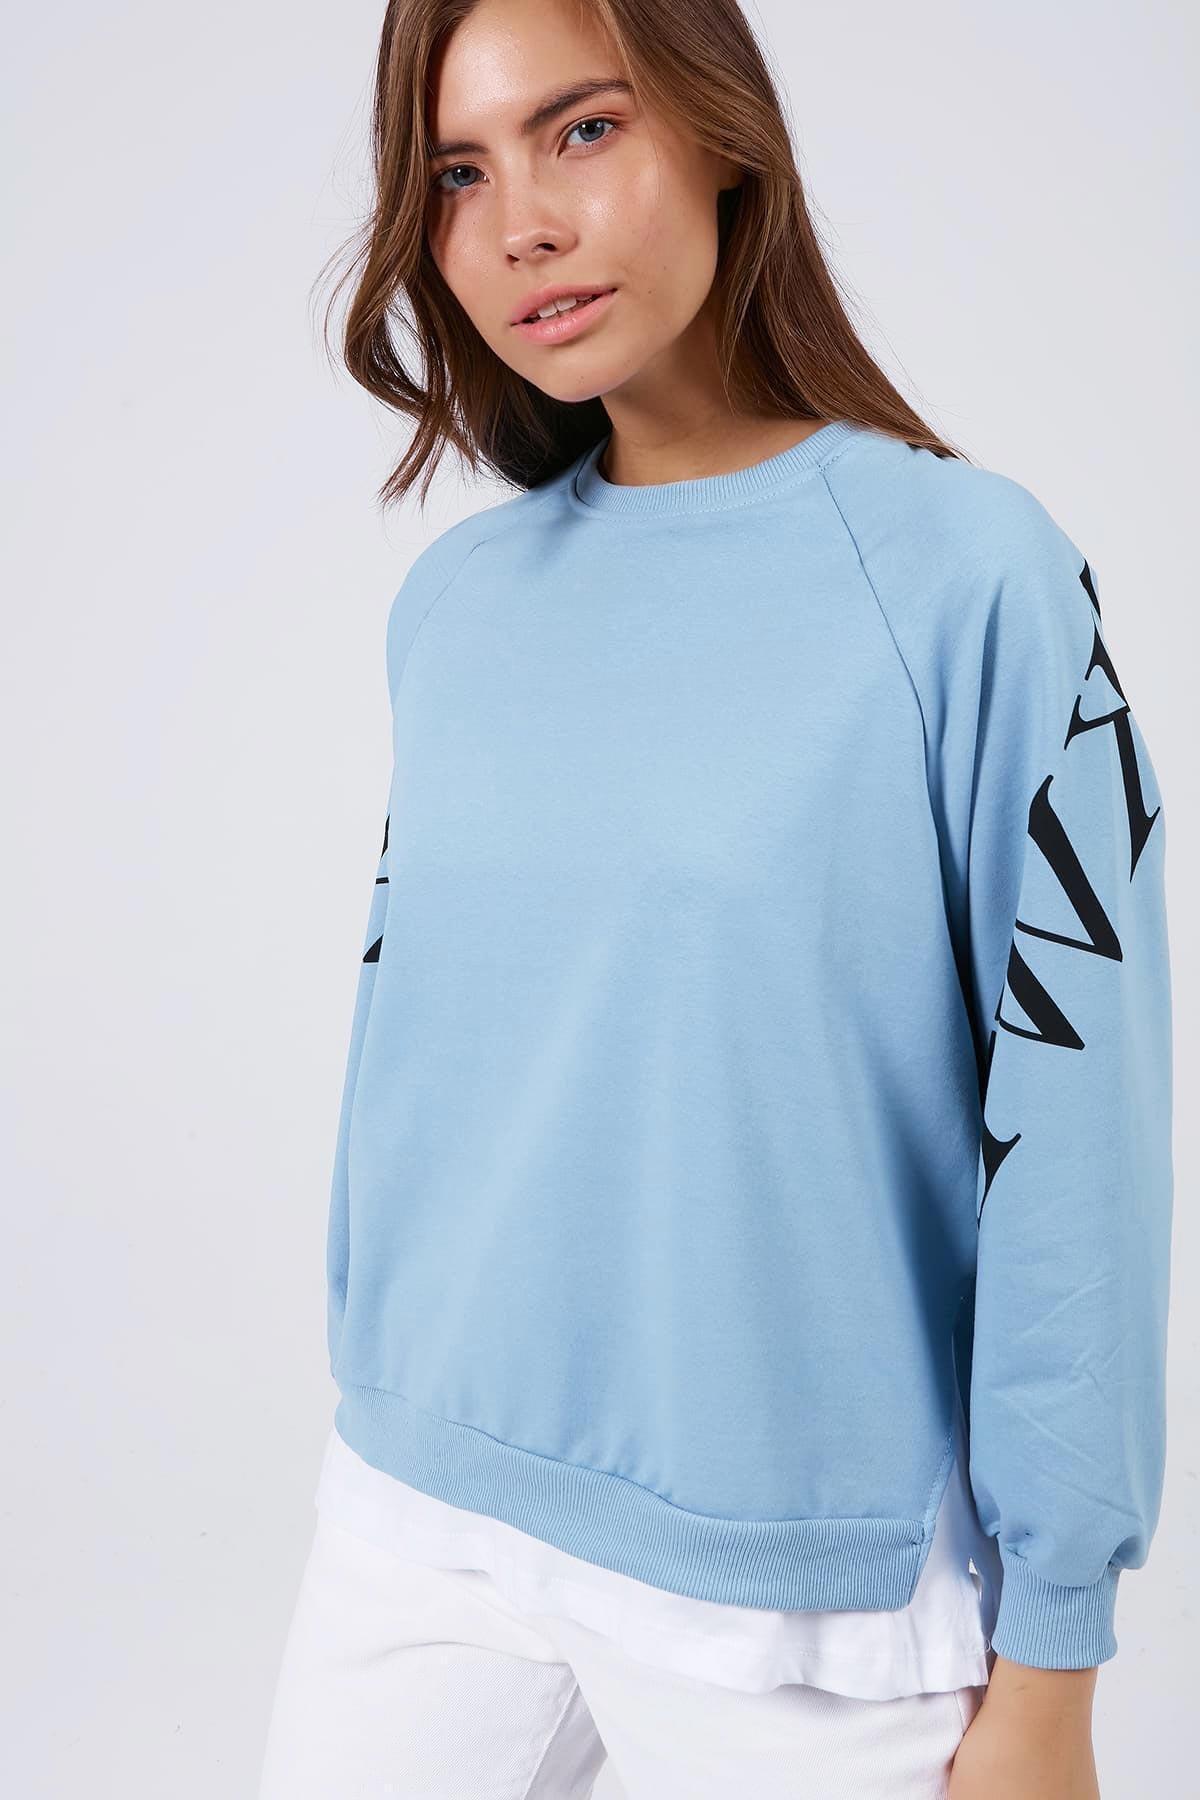 Pattaya Kadın Kolu Baskılı Tişörtlü Uzun Kollu Sweatshirt Y20w167-7603 1